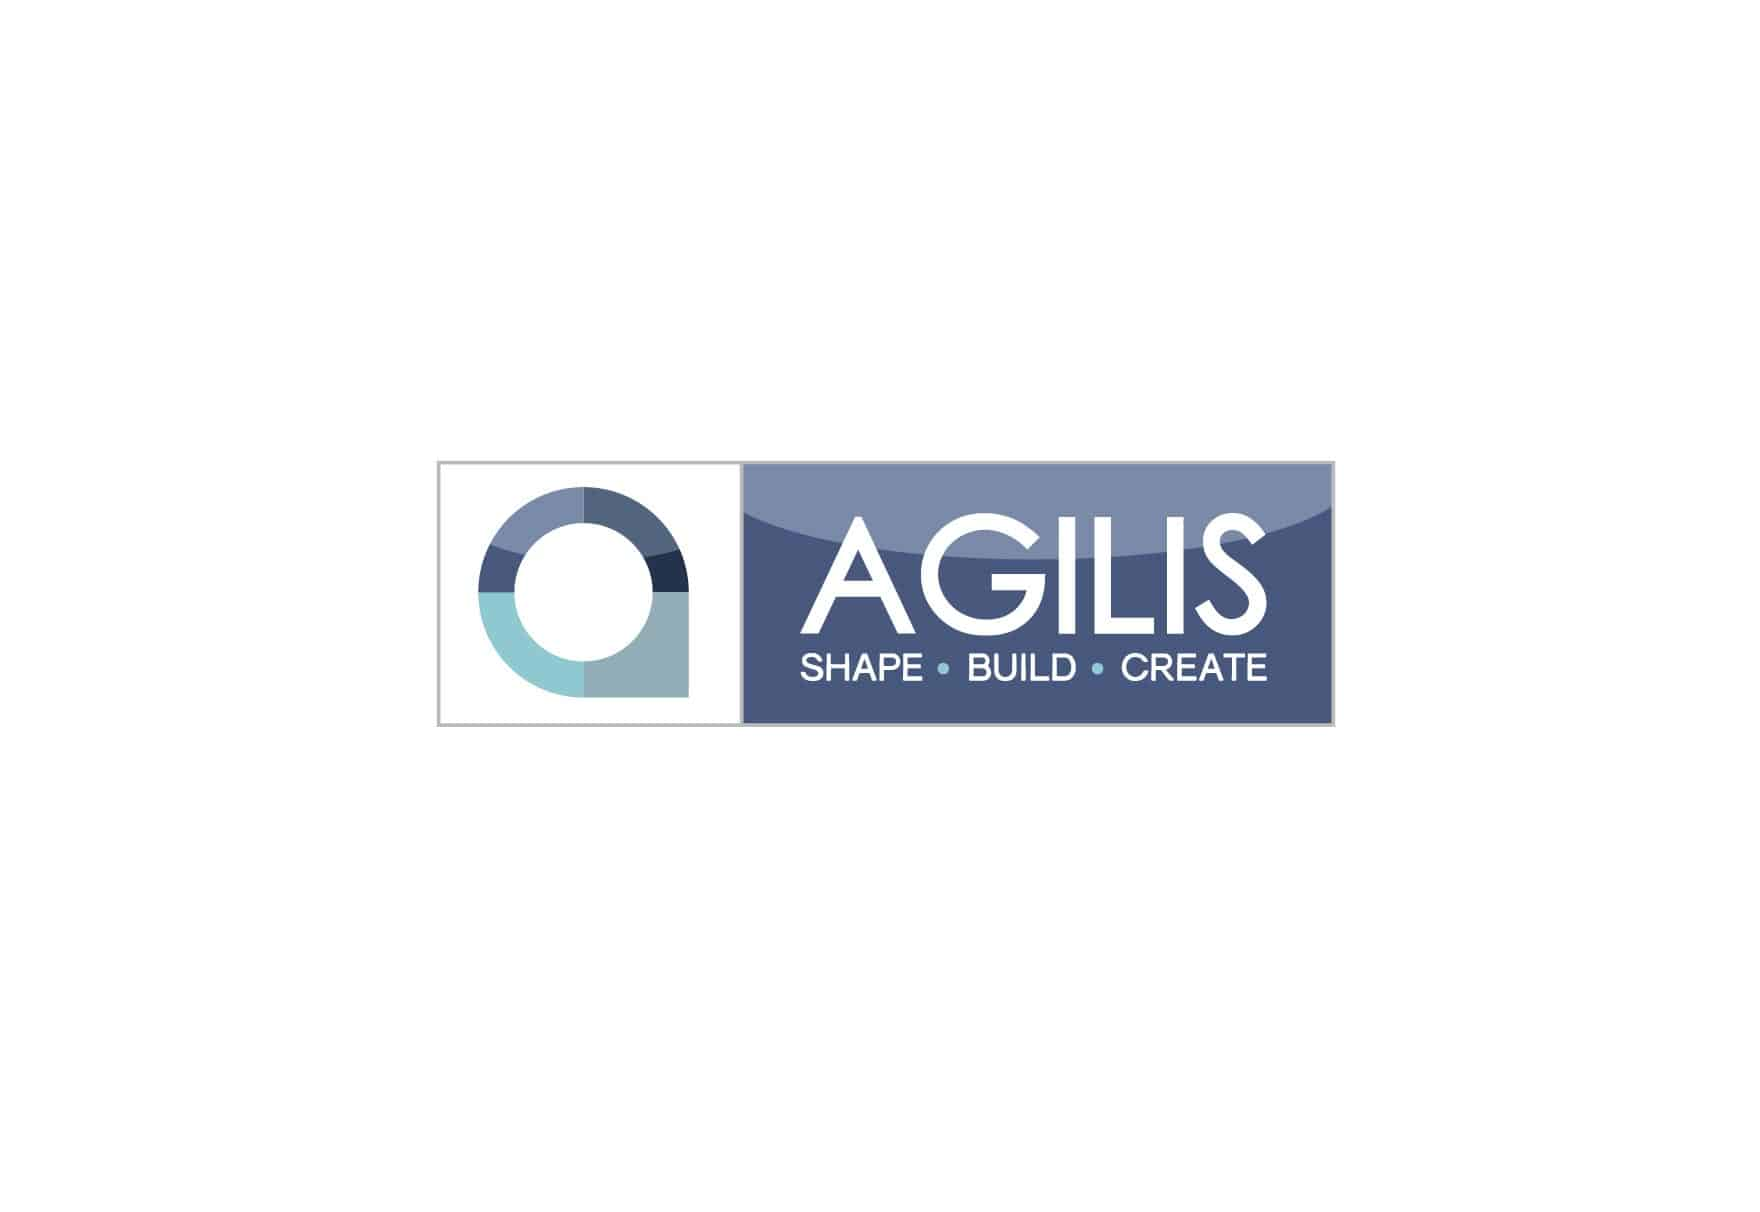 agilis-logo-design